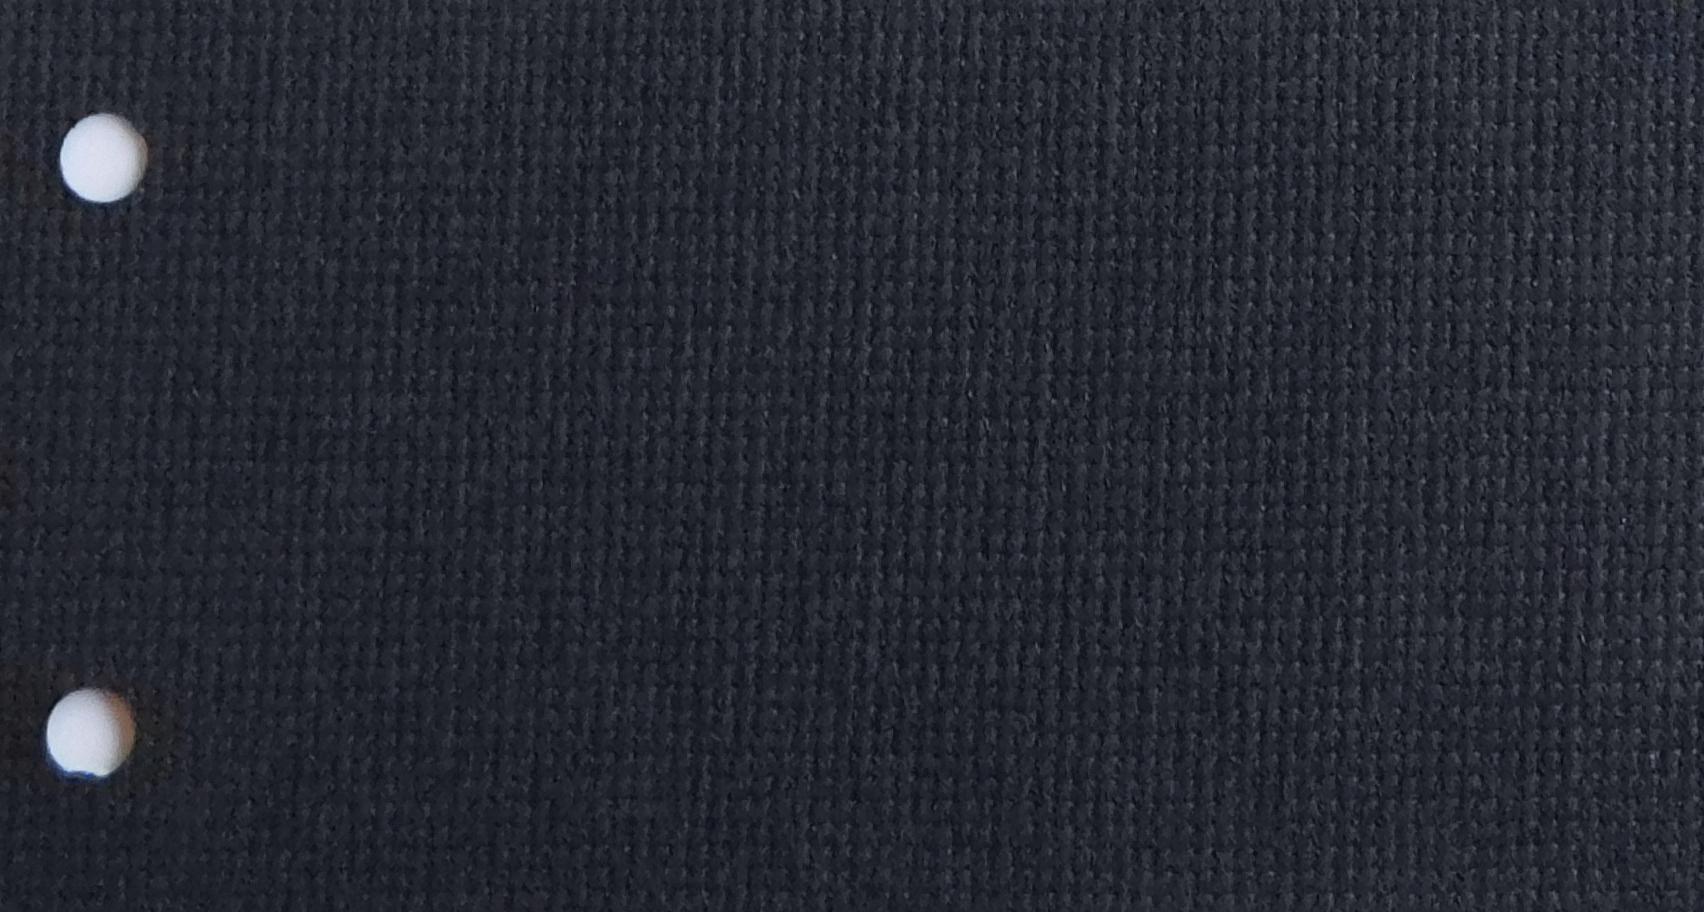 Guardian Jet Black Vertical Blind fabric